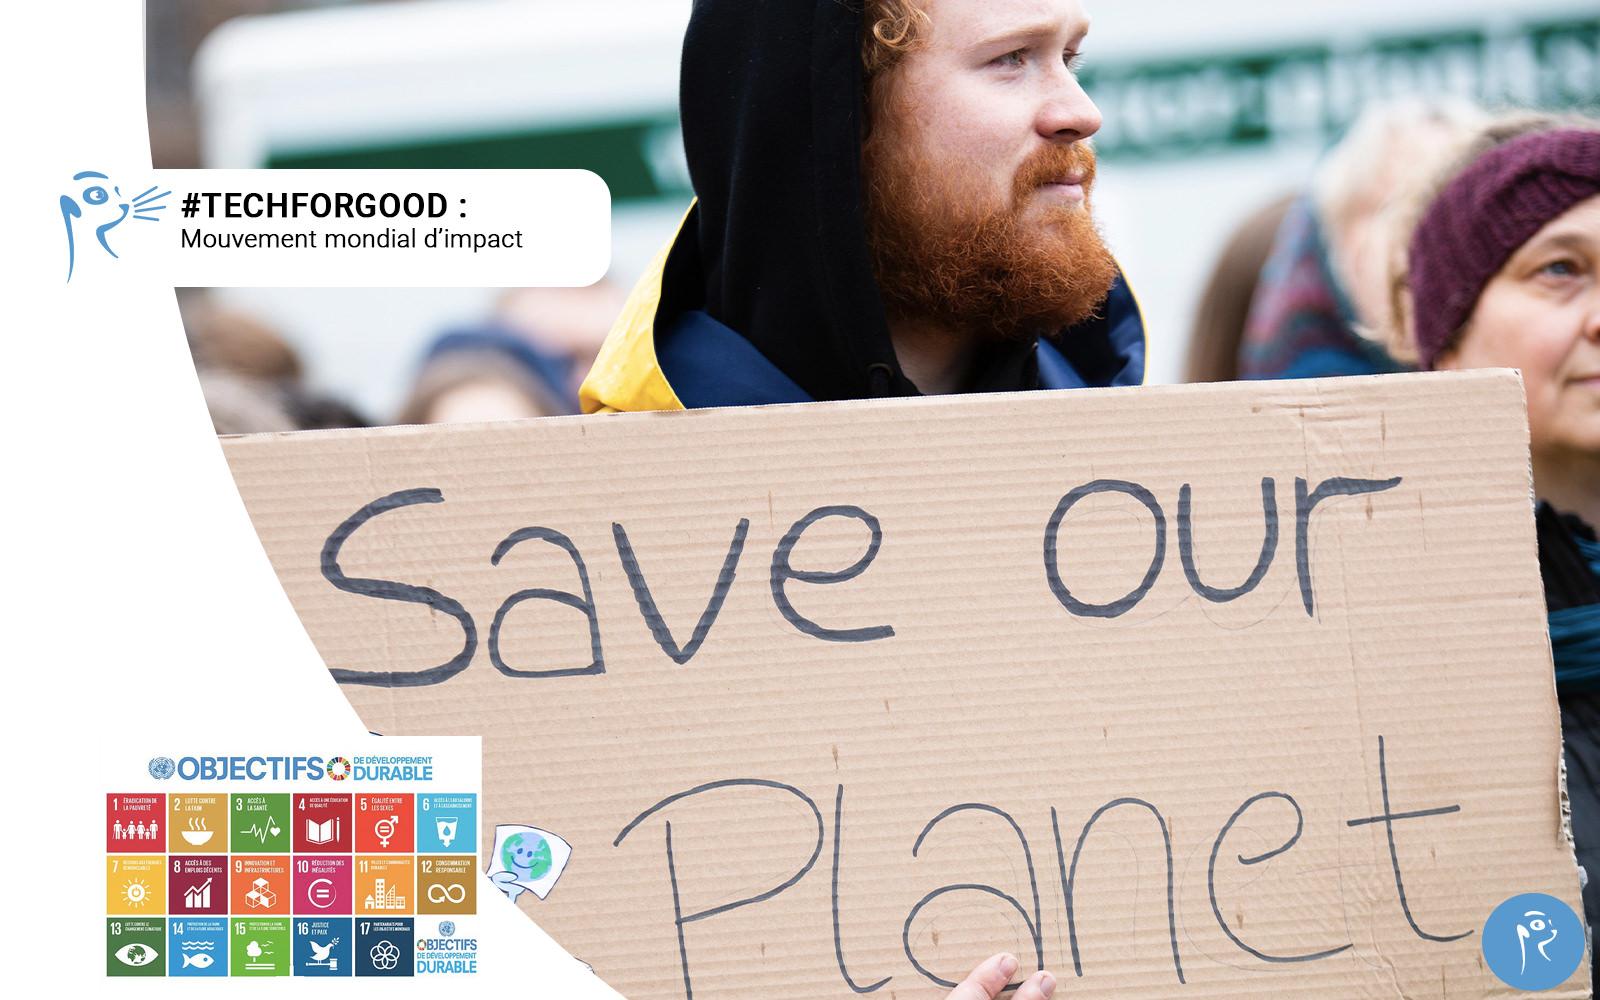 #TechForGood, global impact movement